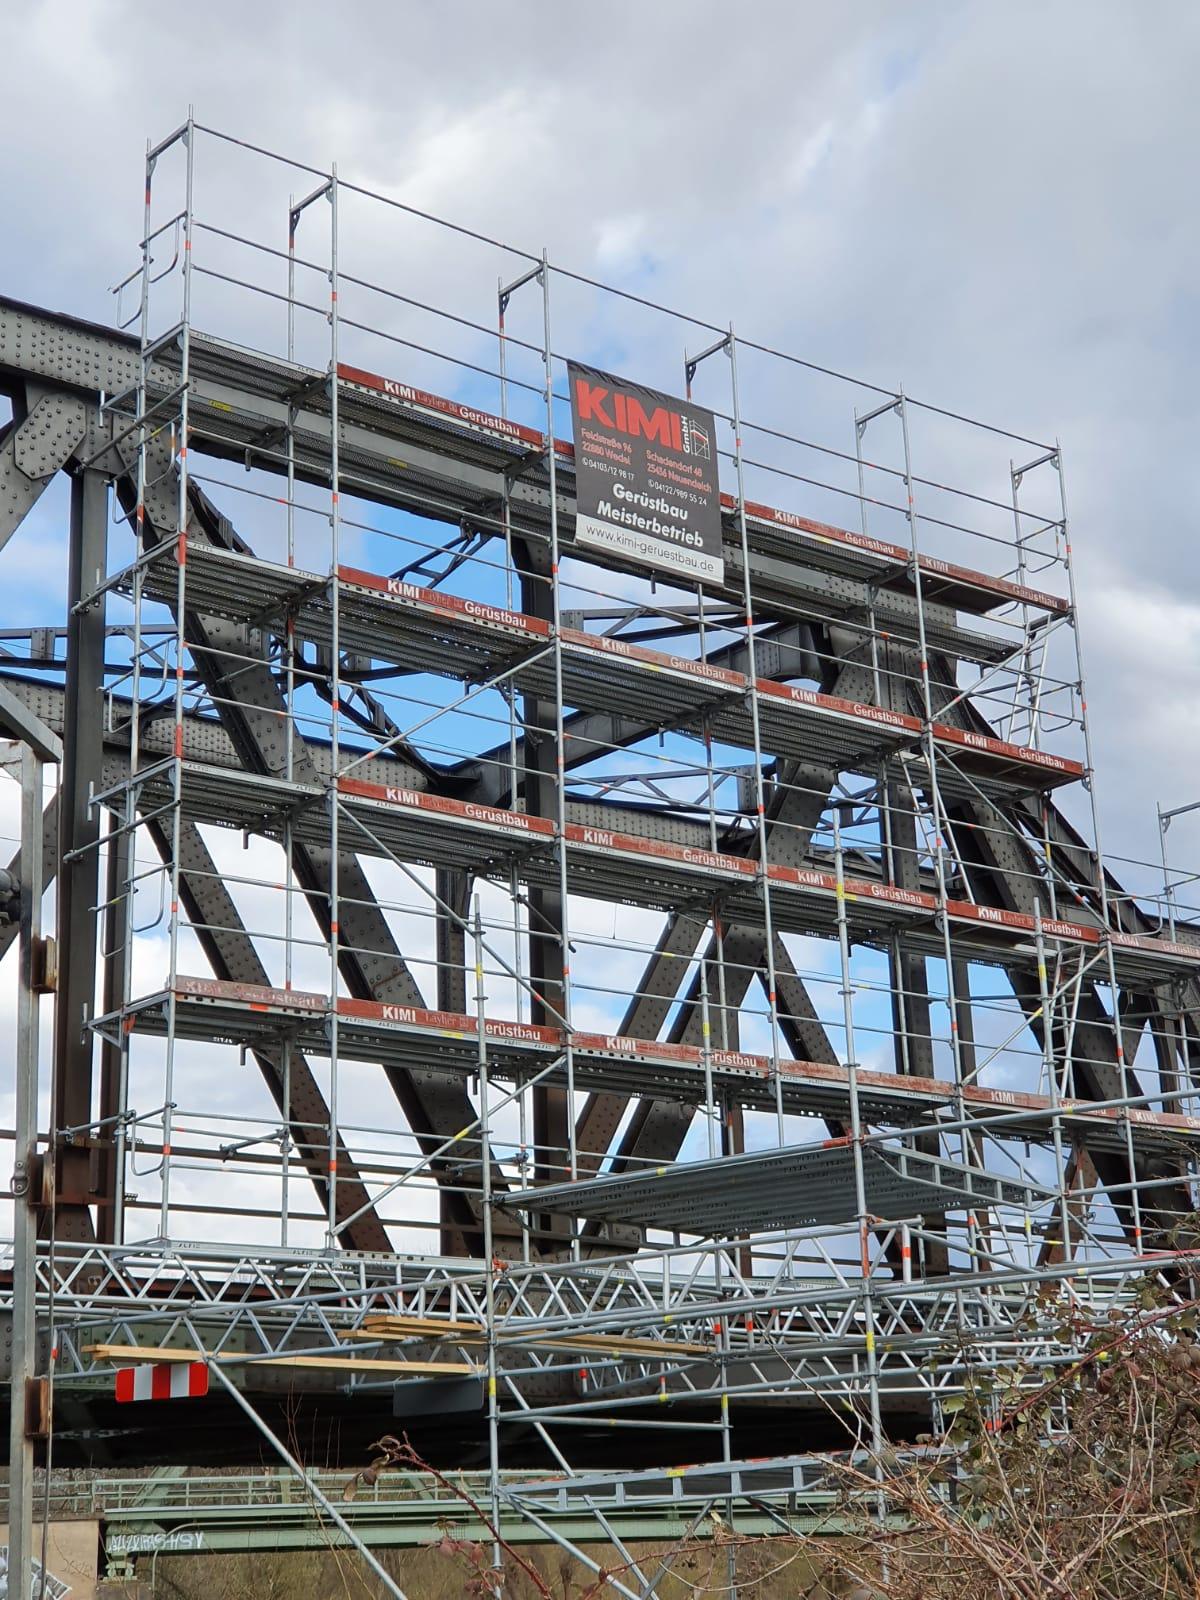 Kimi-Geruestbau-Trockenbau-Fassadengeruest-Wedel-Uetersen-Hamburg-Stahlbau-Schröder-Bild-2